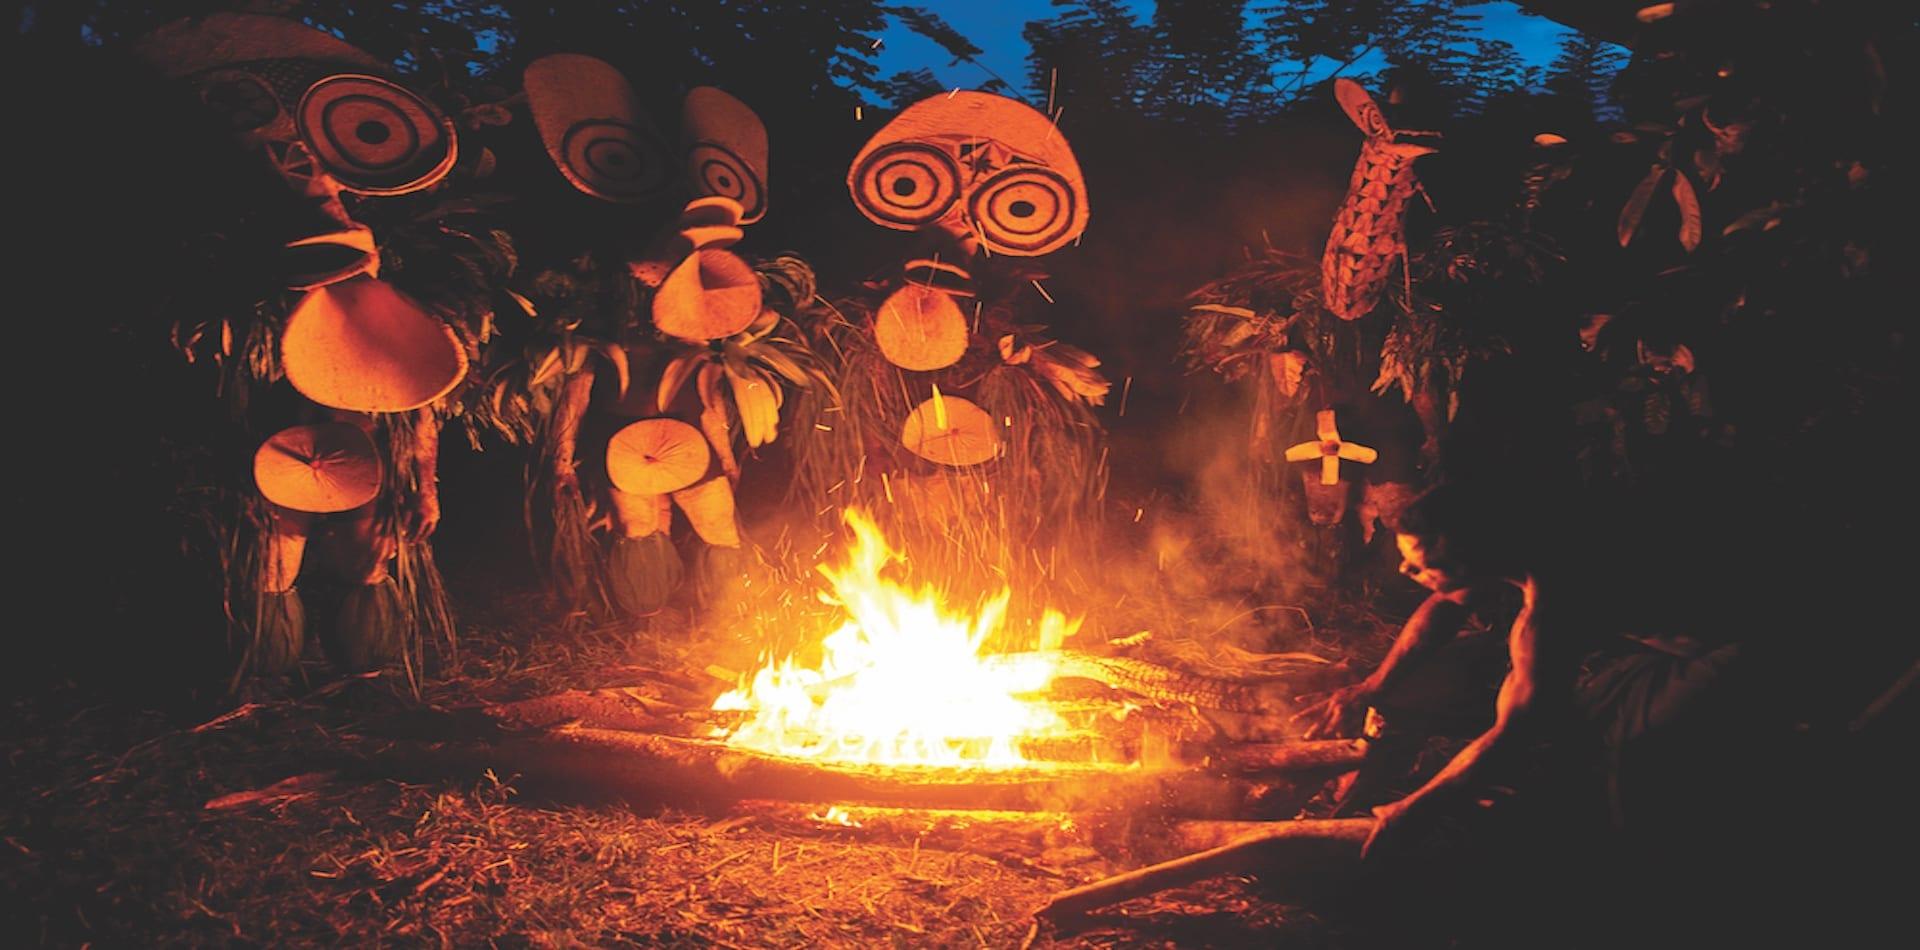 tribe gathers around fire pit